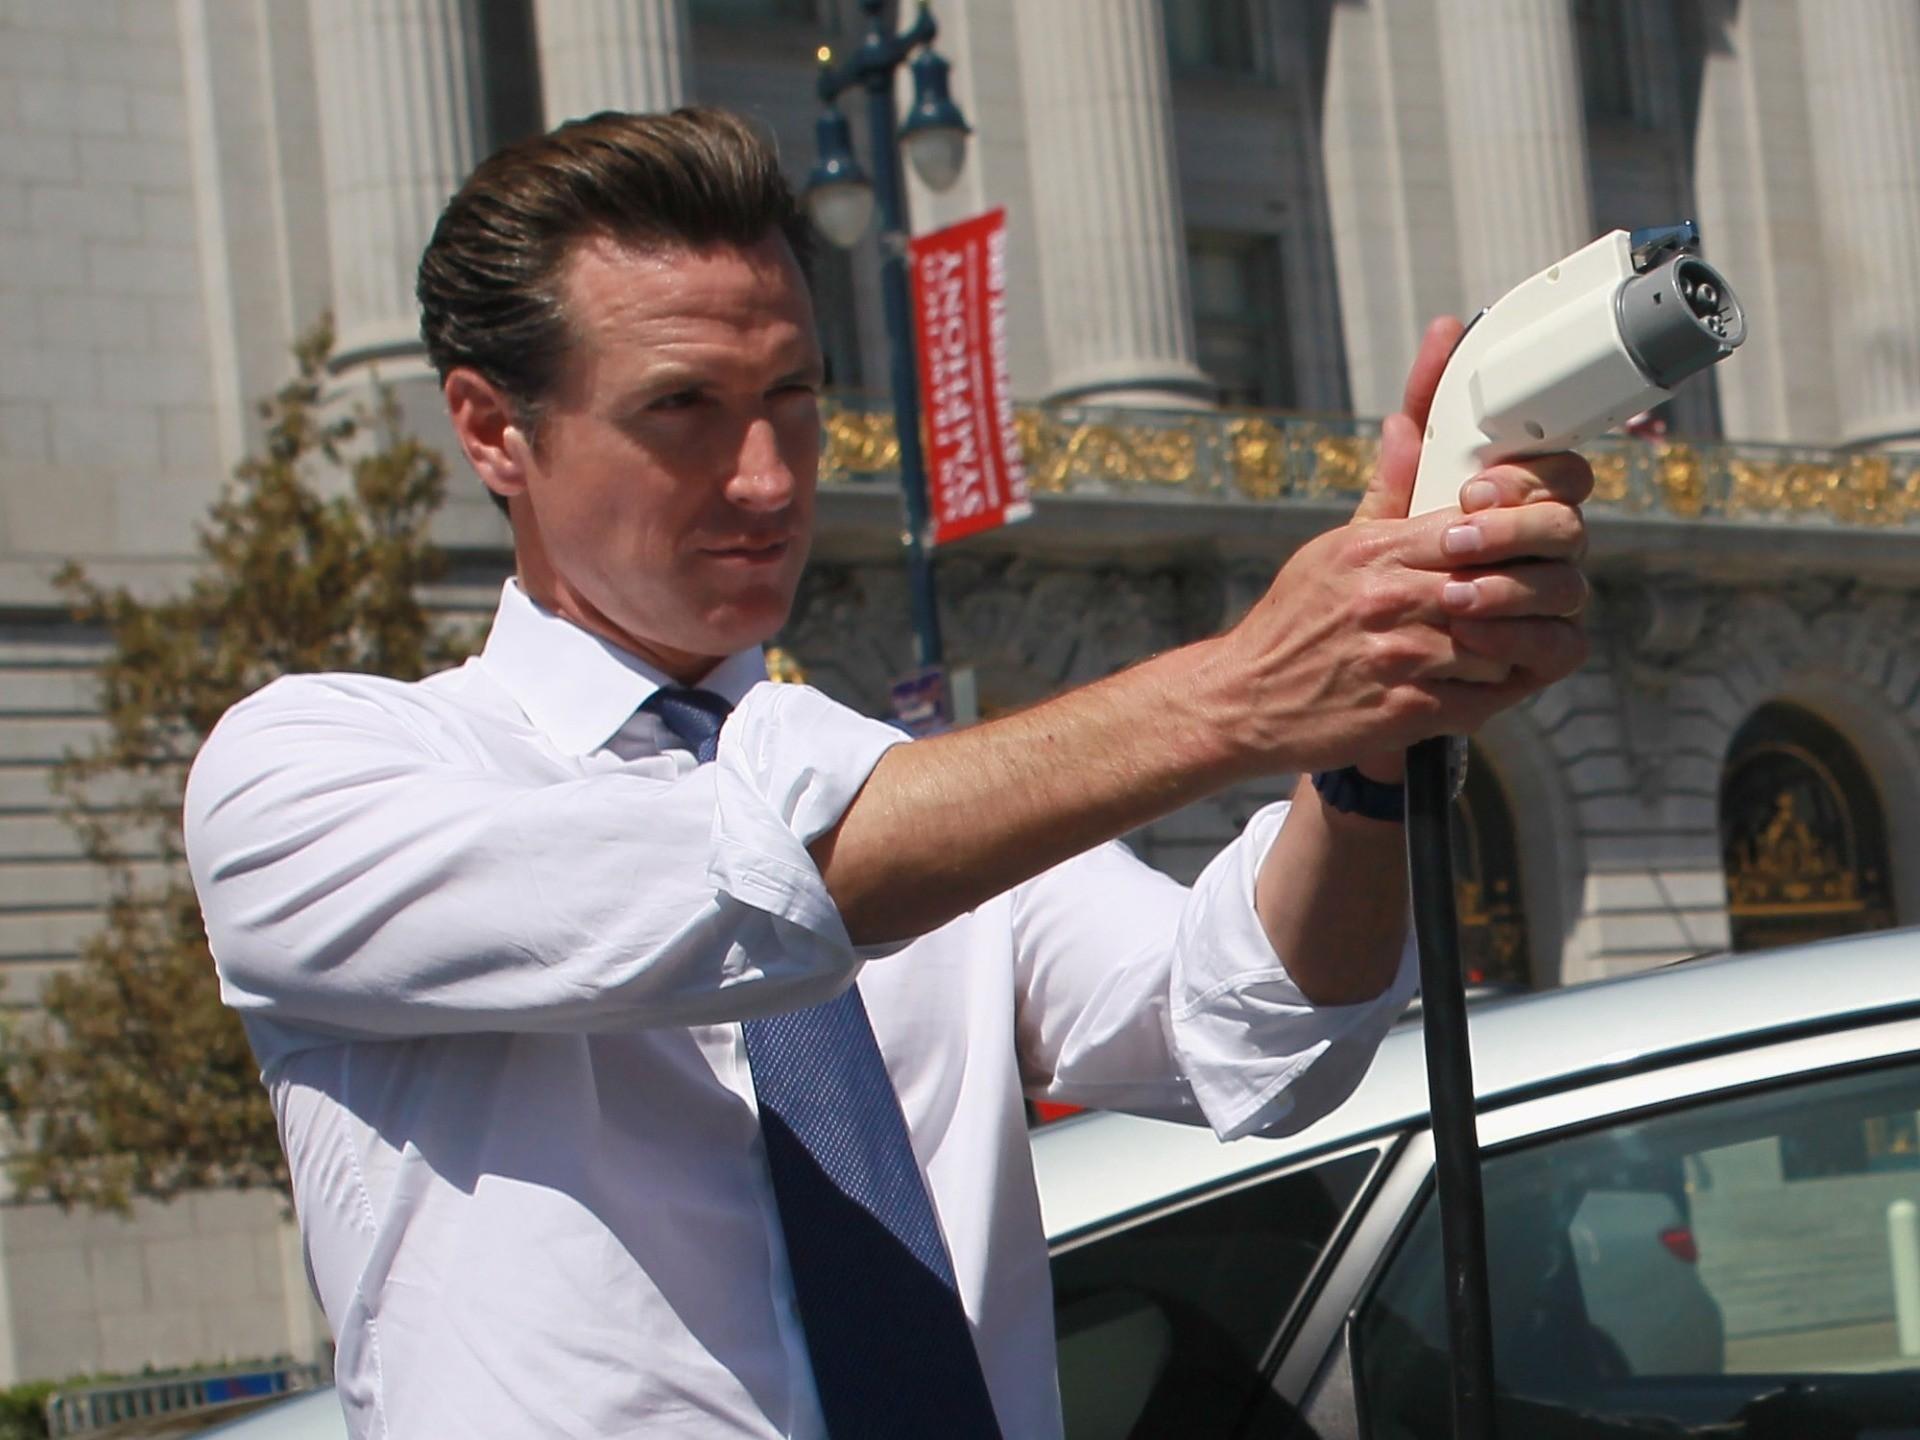 California S Gavin Newsom Bans Gas Powered Vehicles Effective 2035